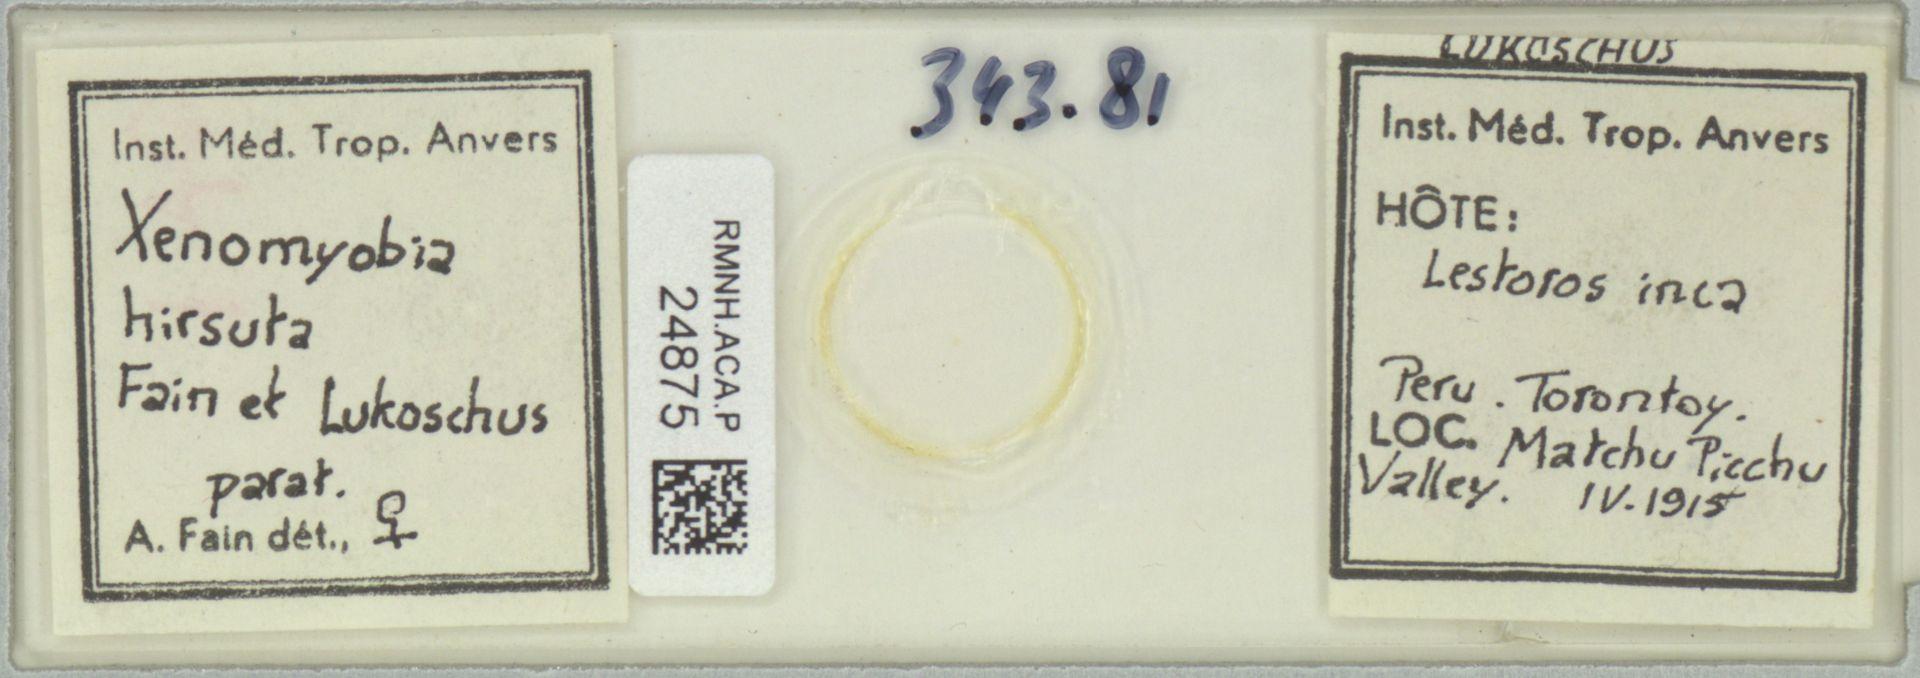 RMNH.ACA.P.24875 | Xenomyobia hirsuta Fain et Lukoschus